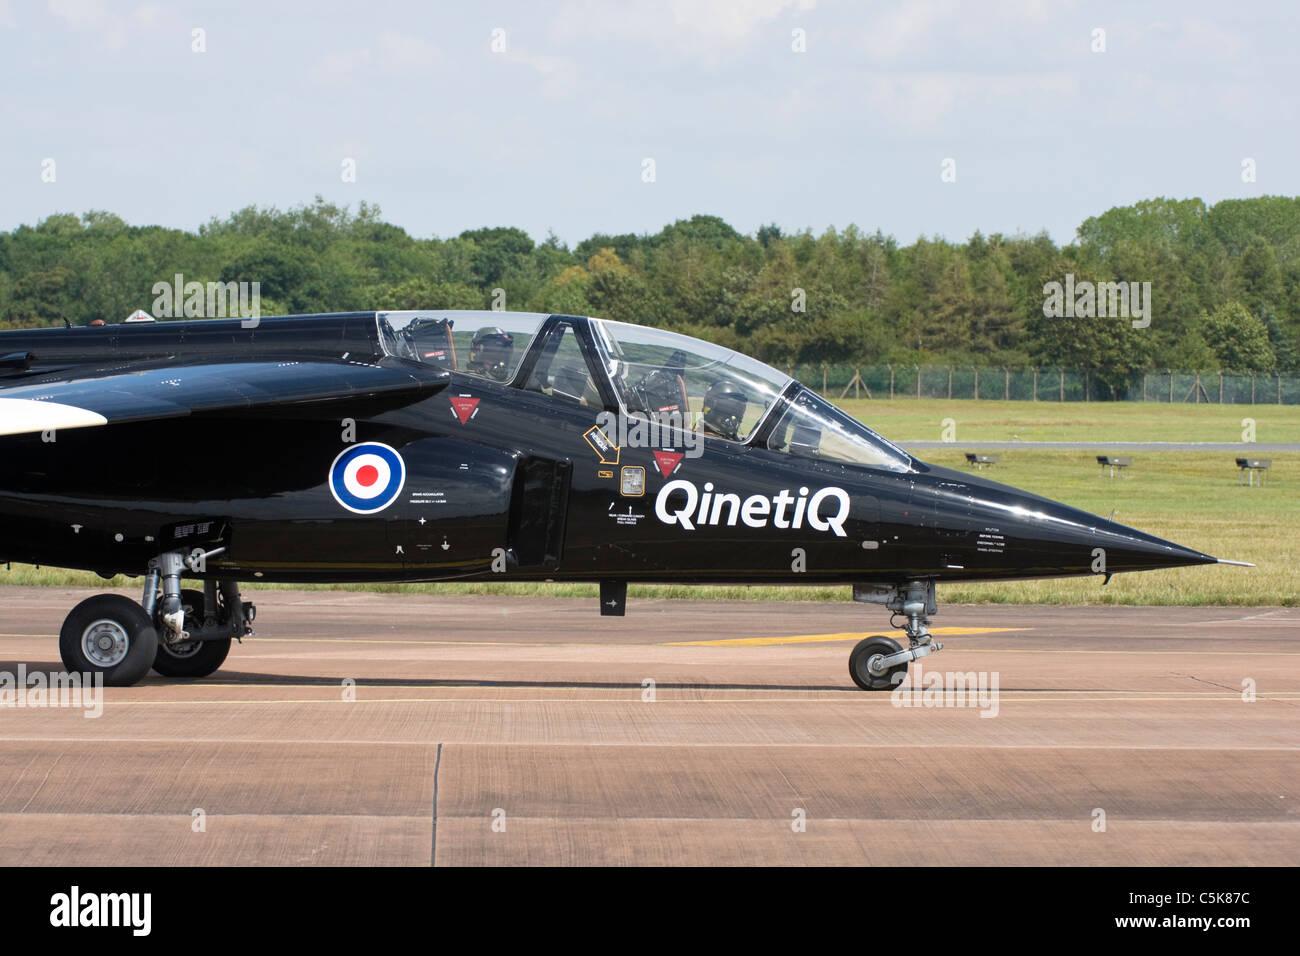 Qinetiq Alpha Jet - Stock Image